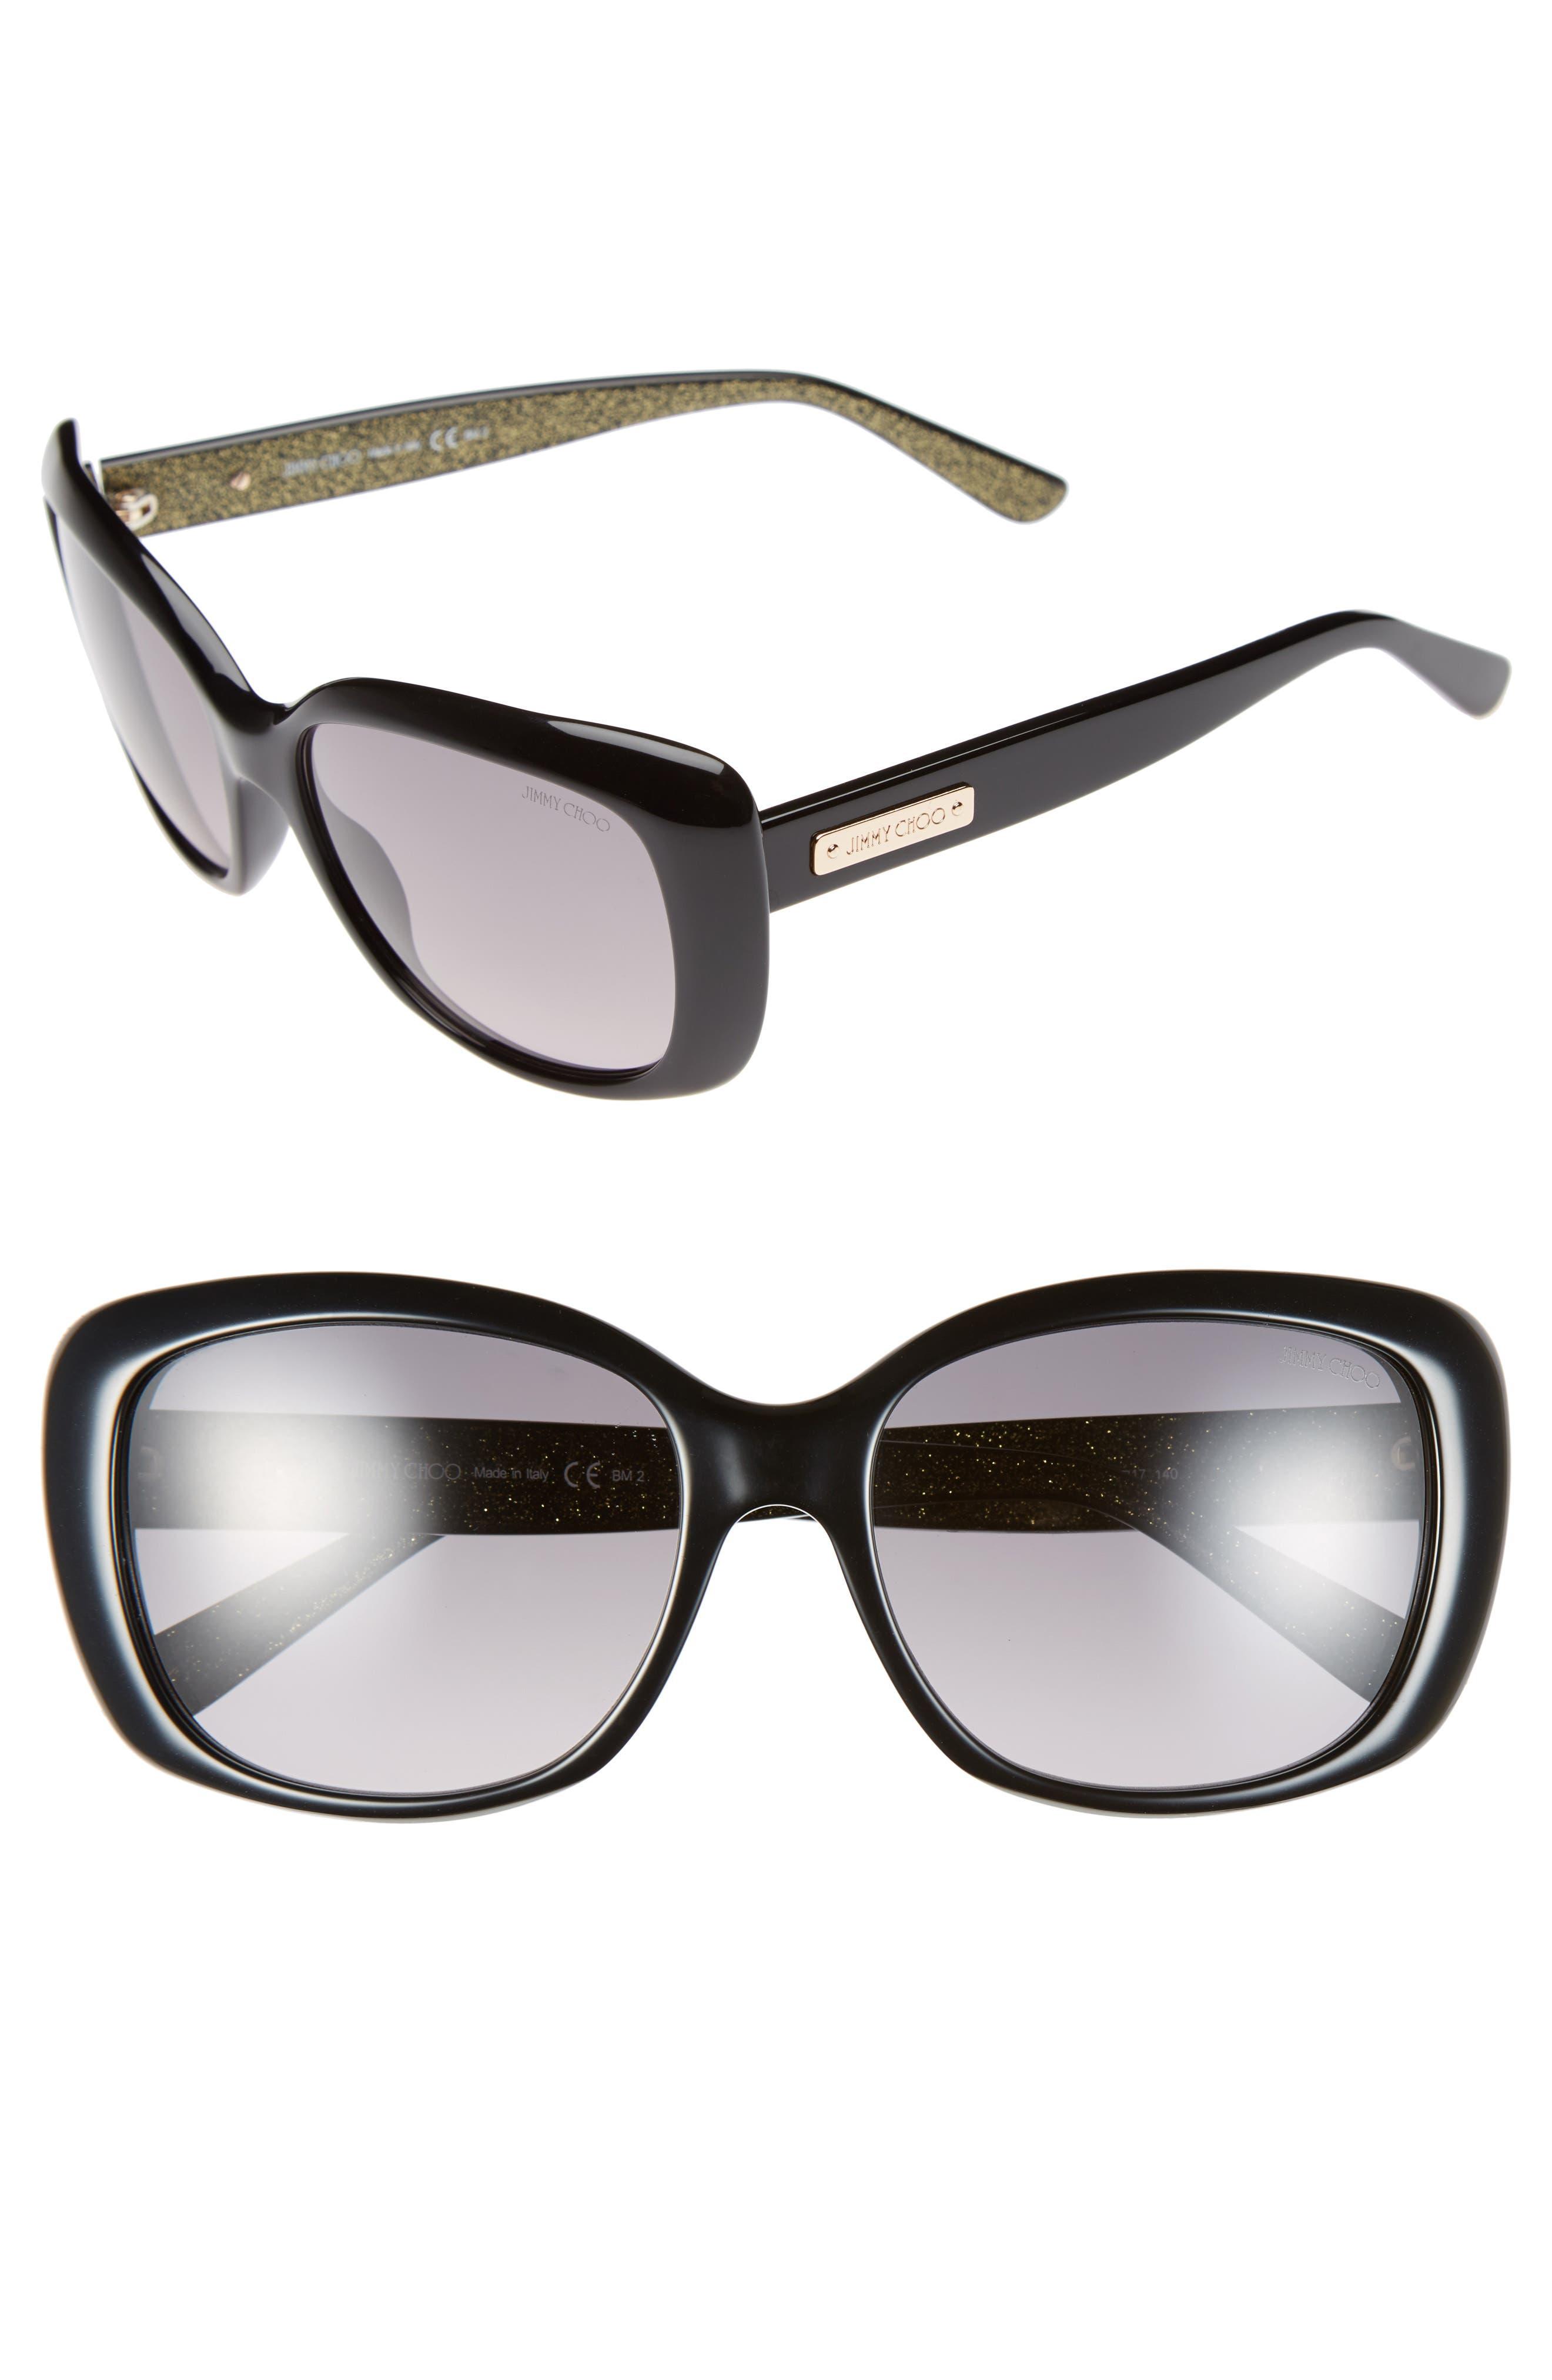 56mm Sunglasses,                             Alternate thumbnail 3, color,                             001